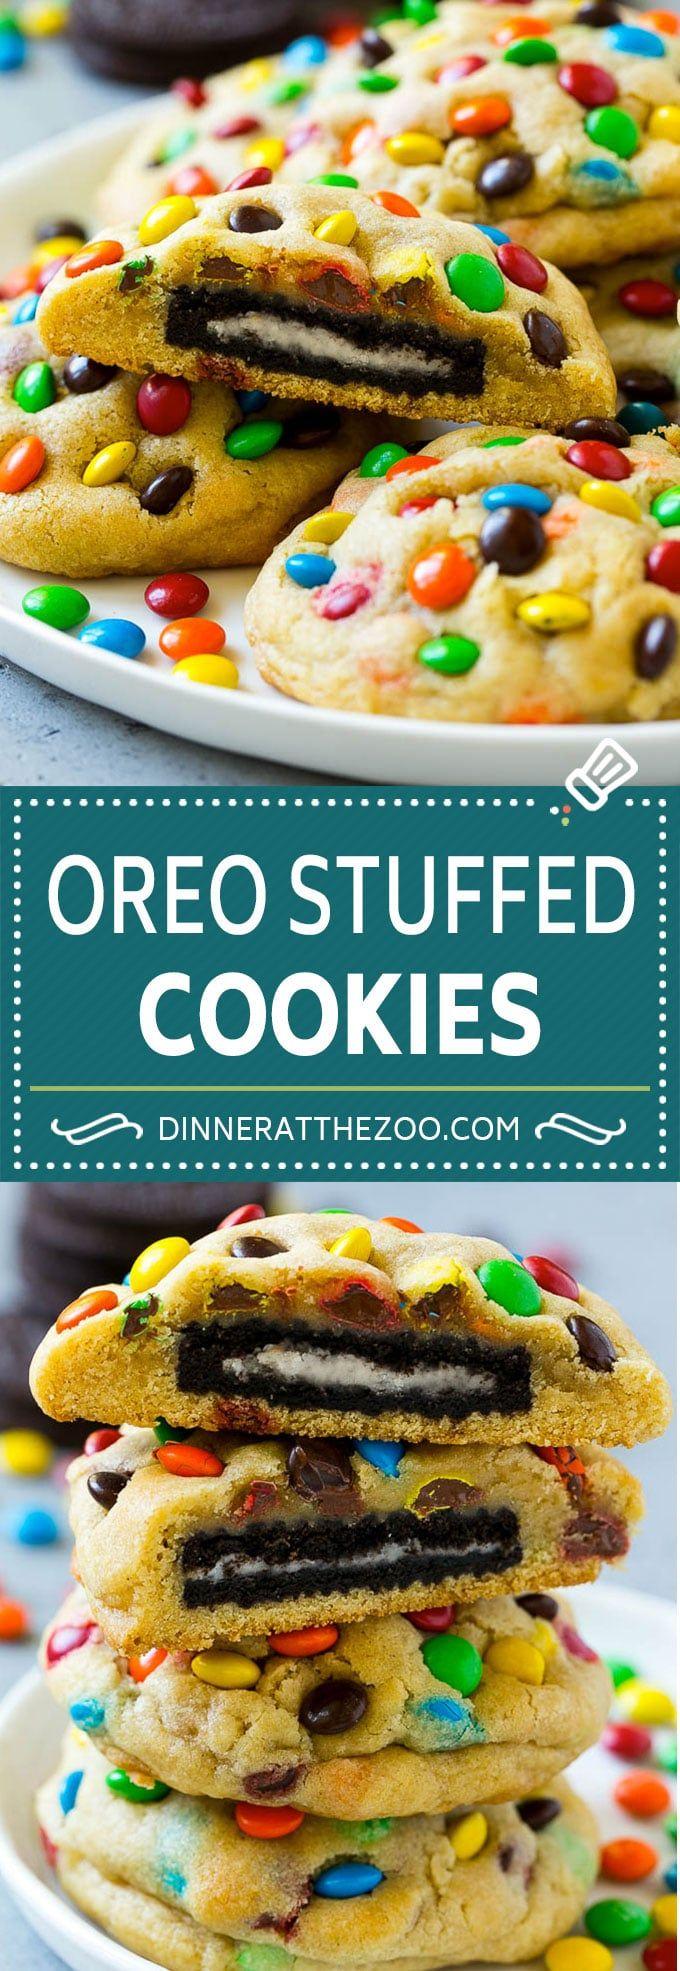 Oreo Stuffed Cookies Oreo Stuffed Cookies Recipe  MMs cookies  Stuffed Cookies